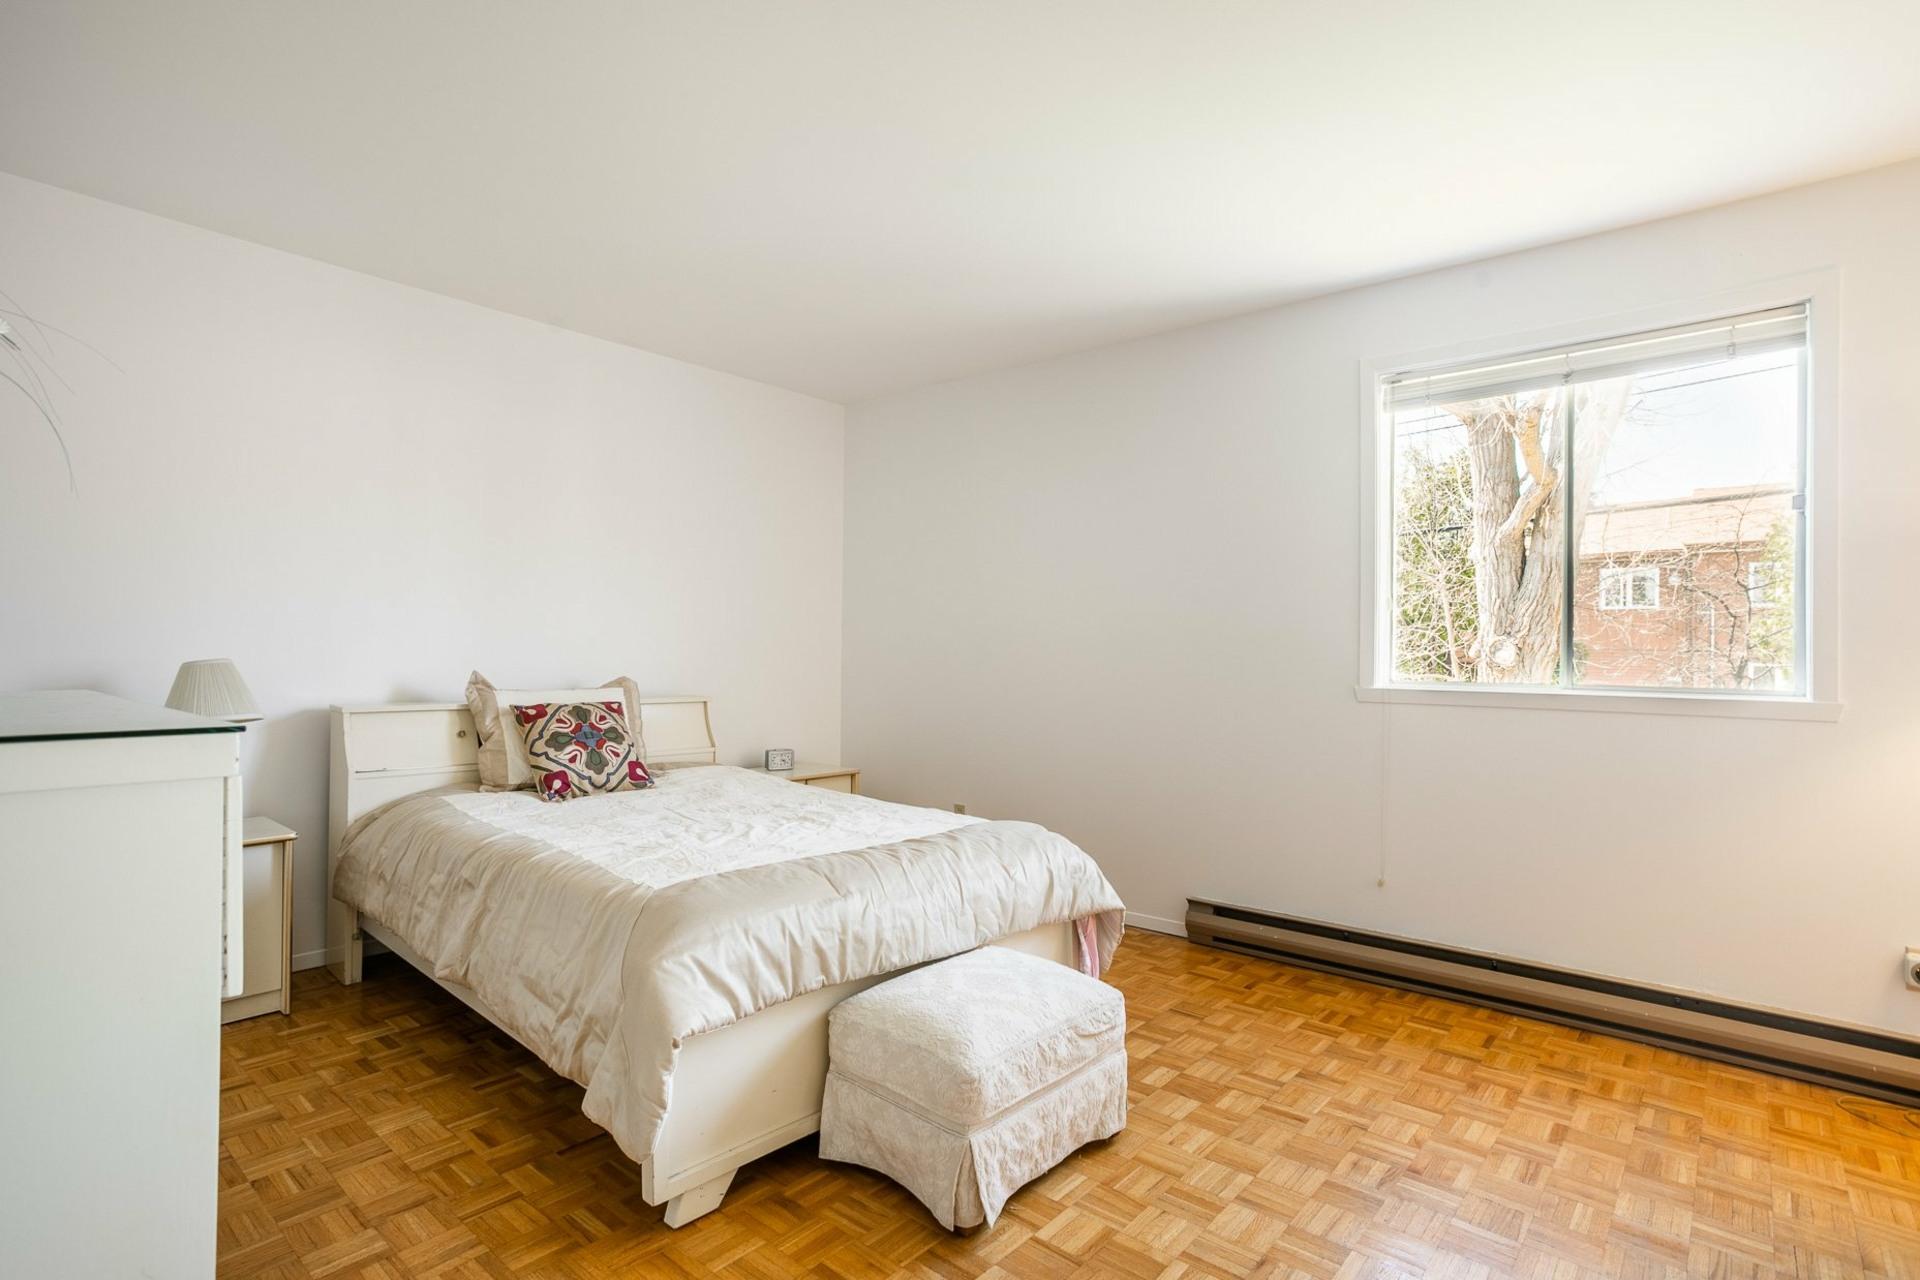 image 8 - House For sale Pierrefonds-Roxboro Montréal  - 8 rooms